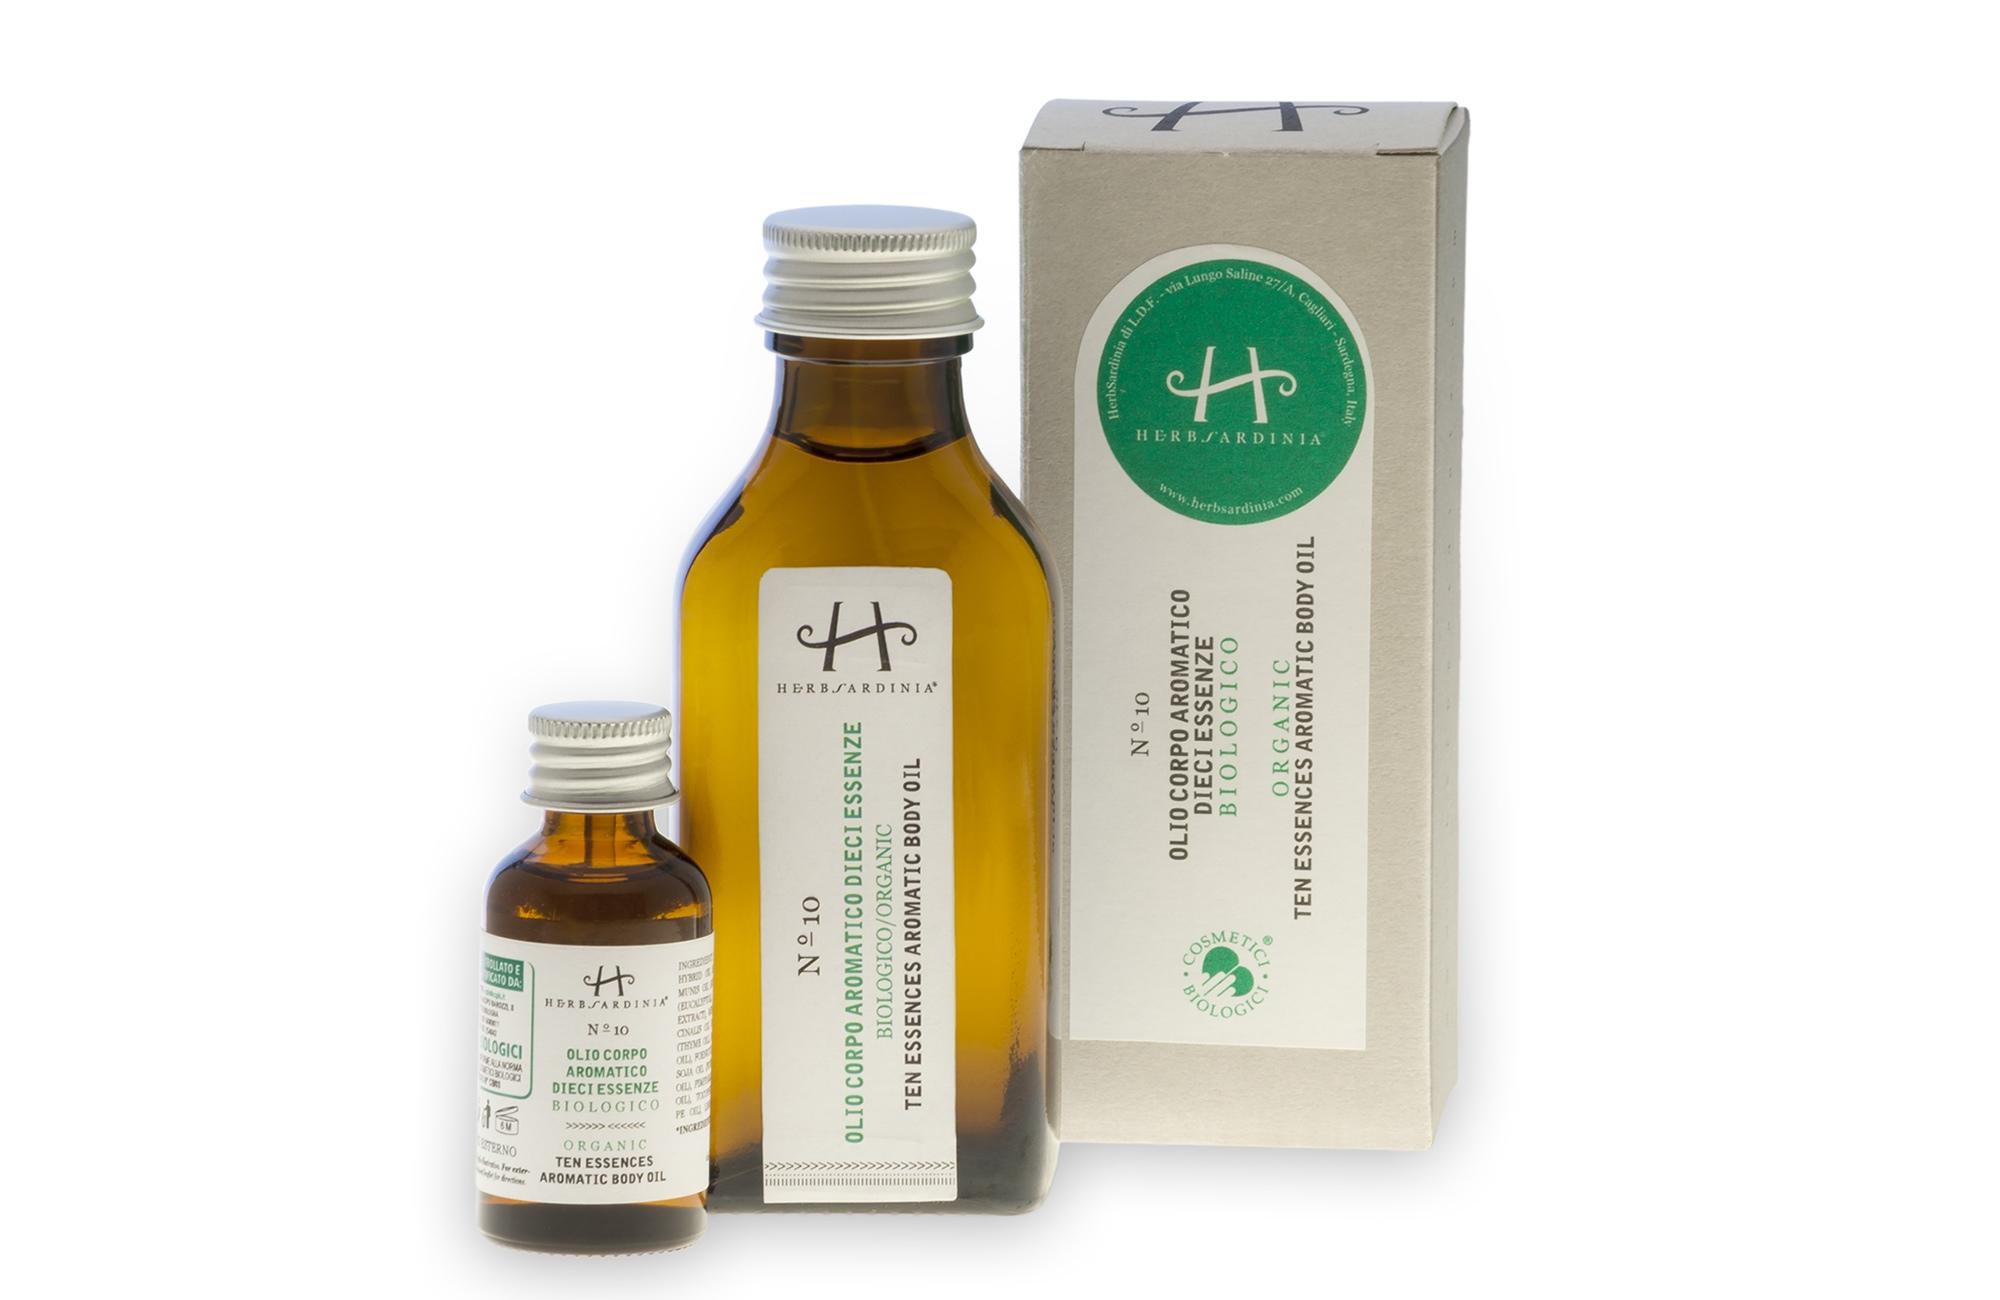 n-10-olio-aromatico-dieci-essenze-biologico1